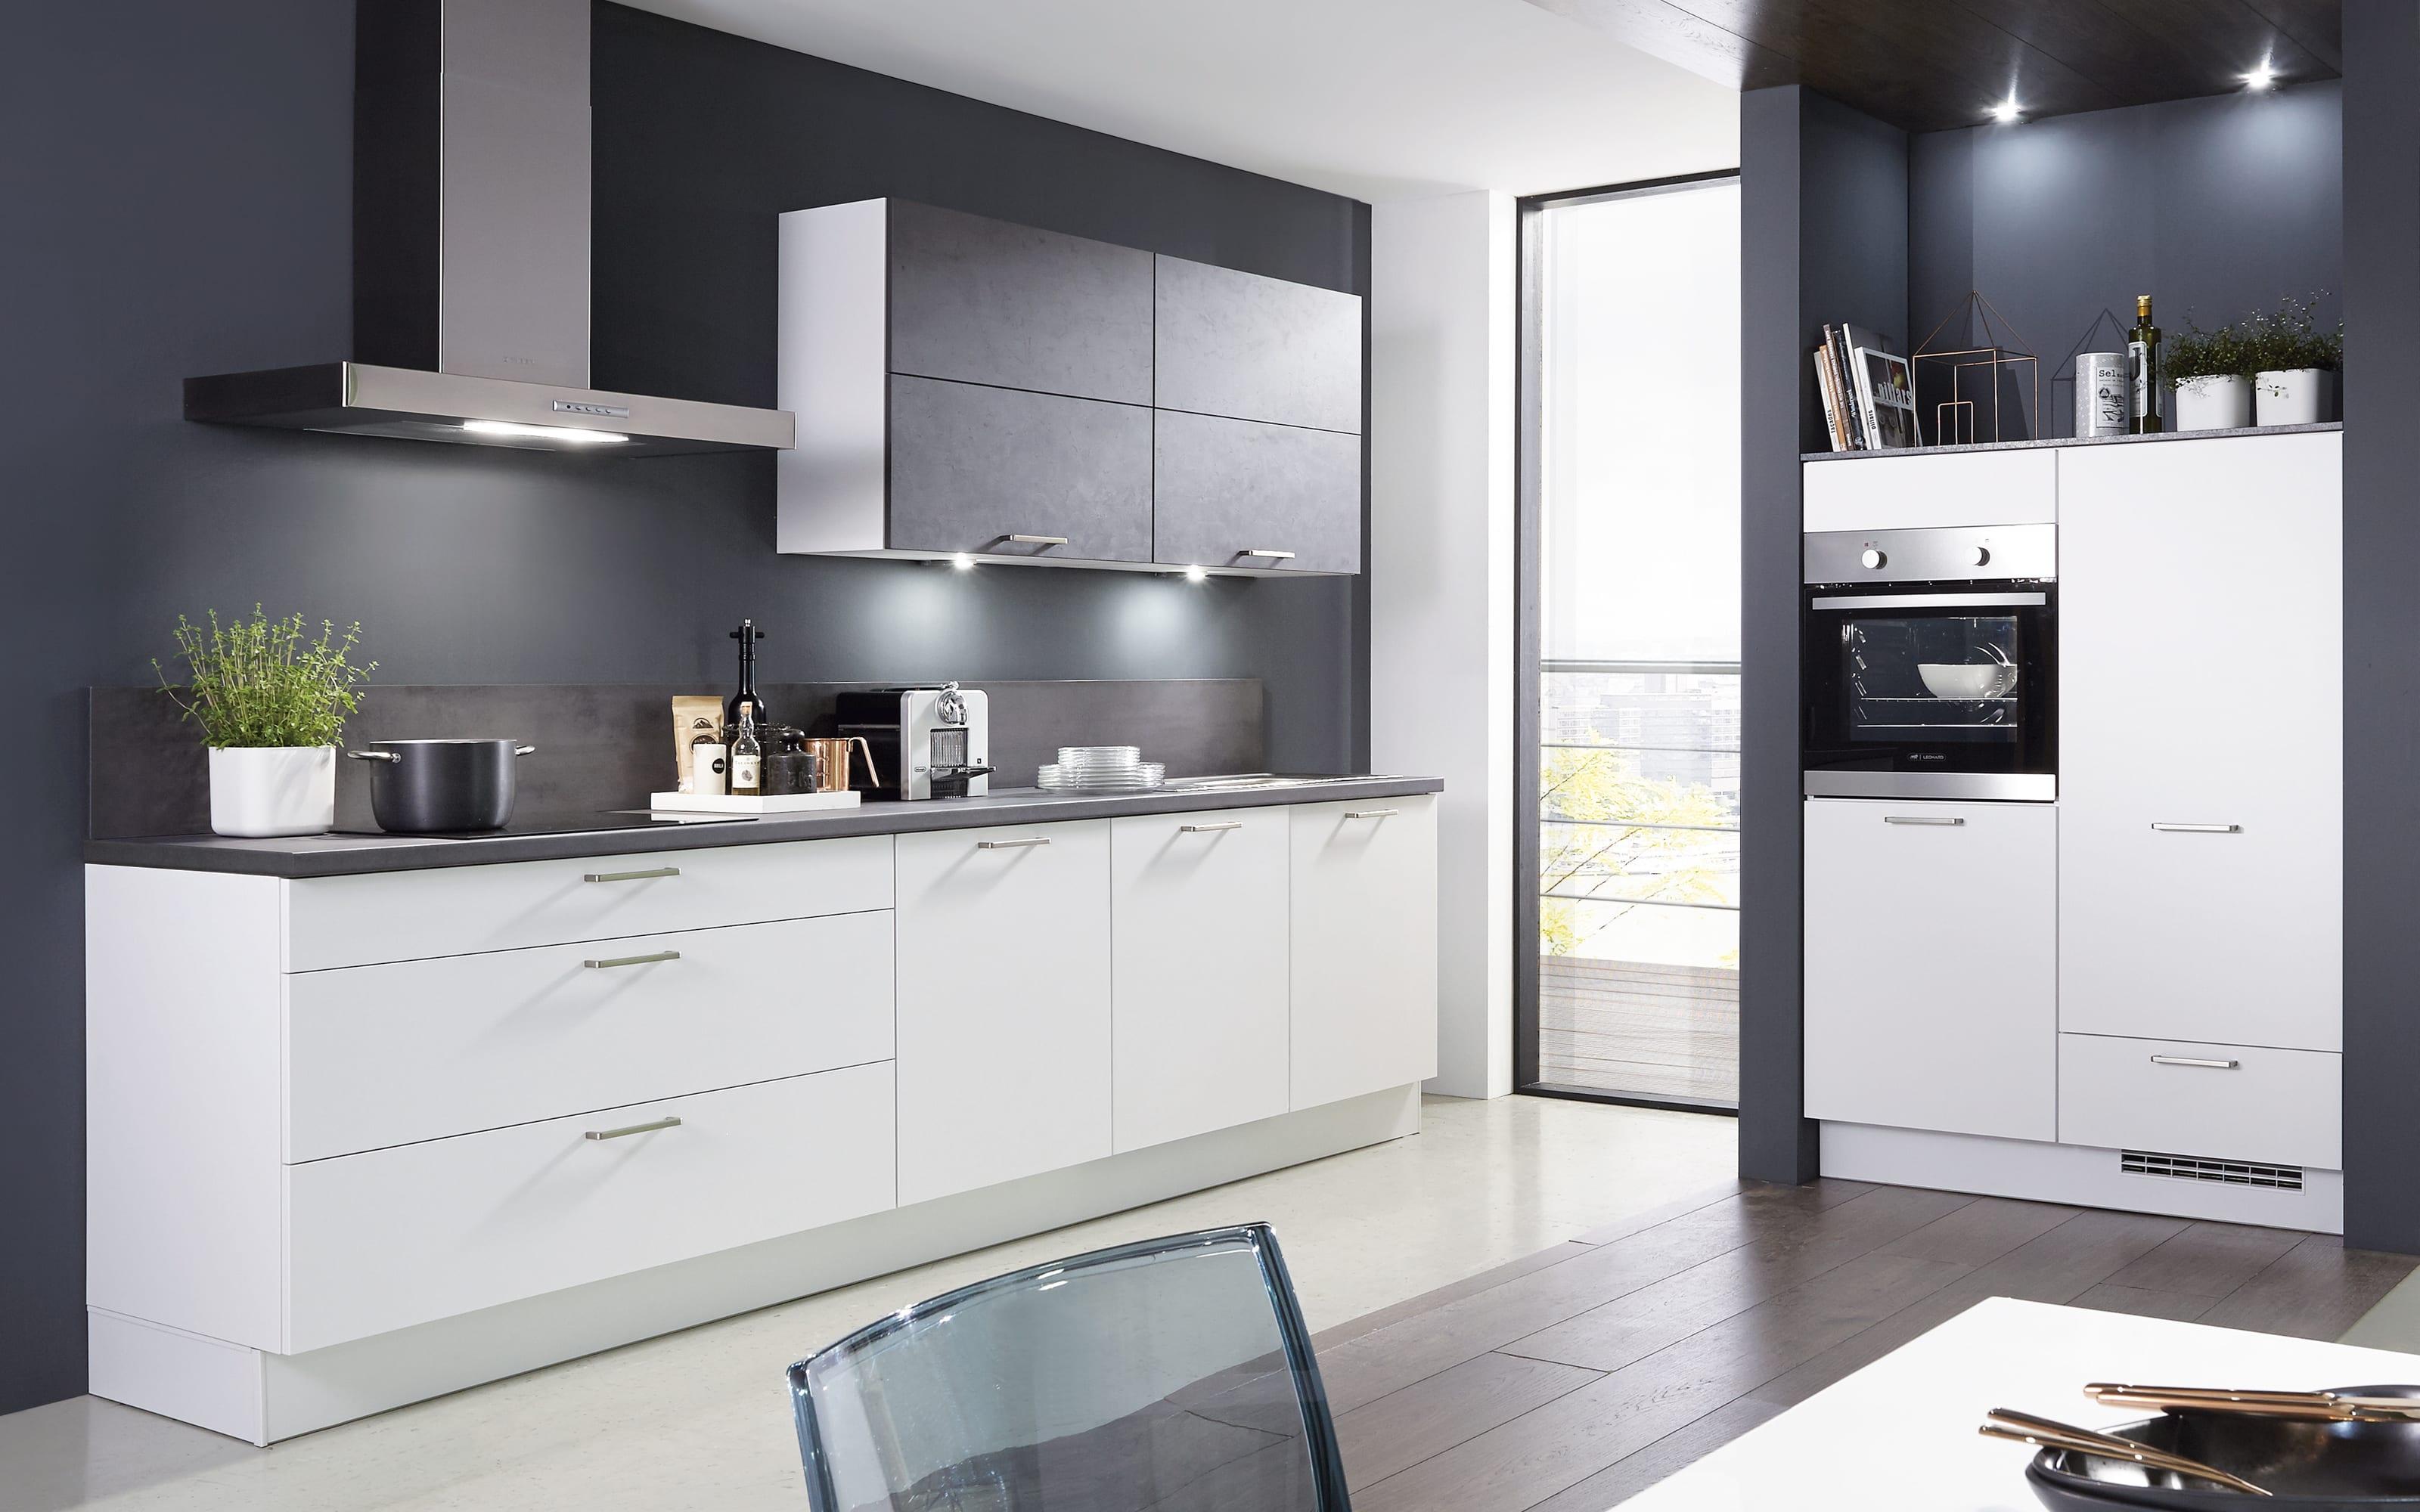 Einbauküche Fashion 168, alpinweiß matt Lack, inklusive Elektrogeräte, inklusive Neff Geschirrspüler